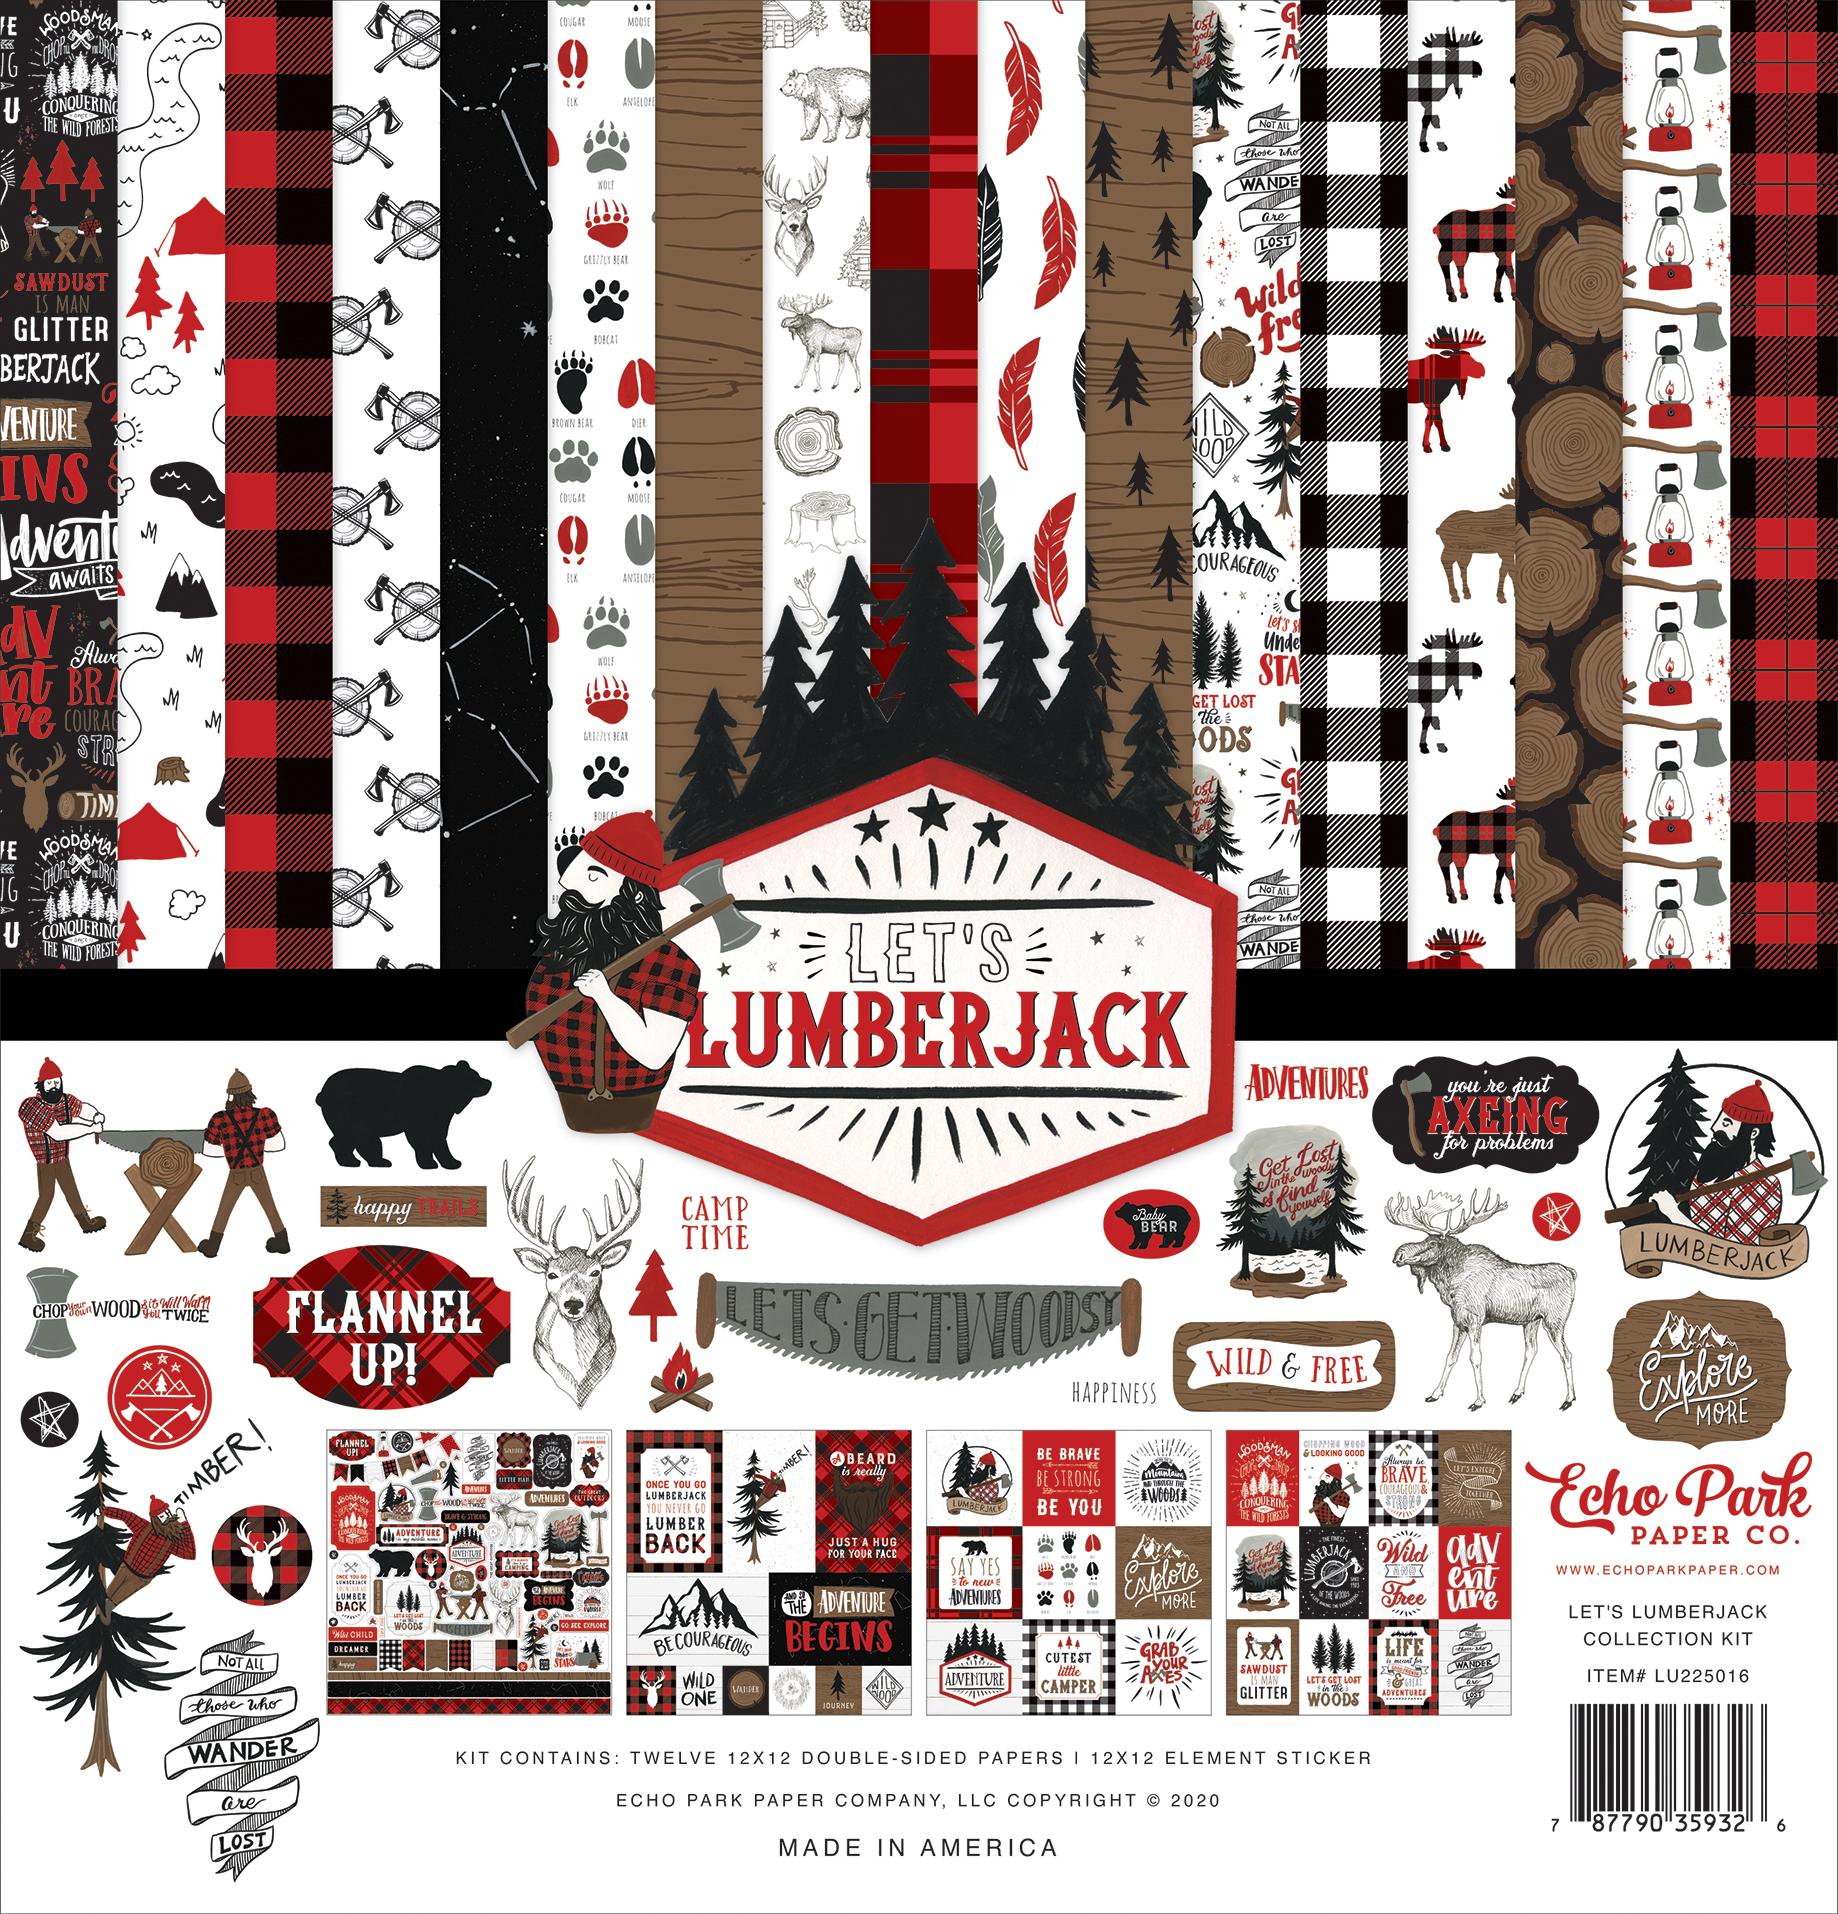 Let's Lumberjack: Collection Kit